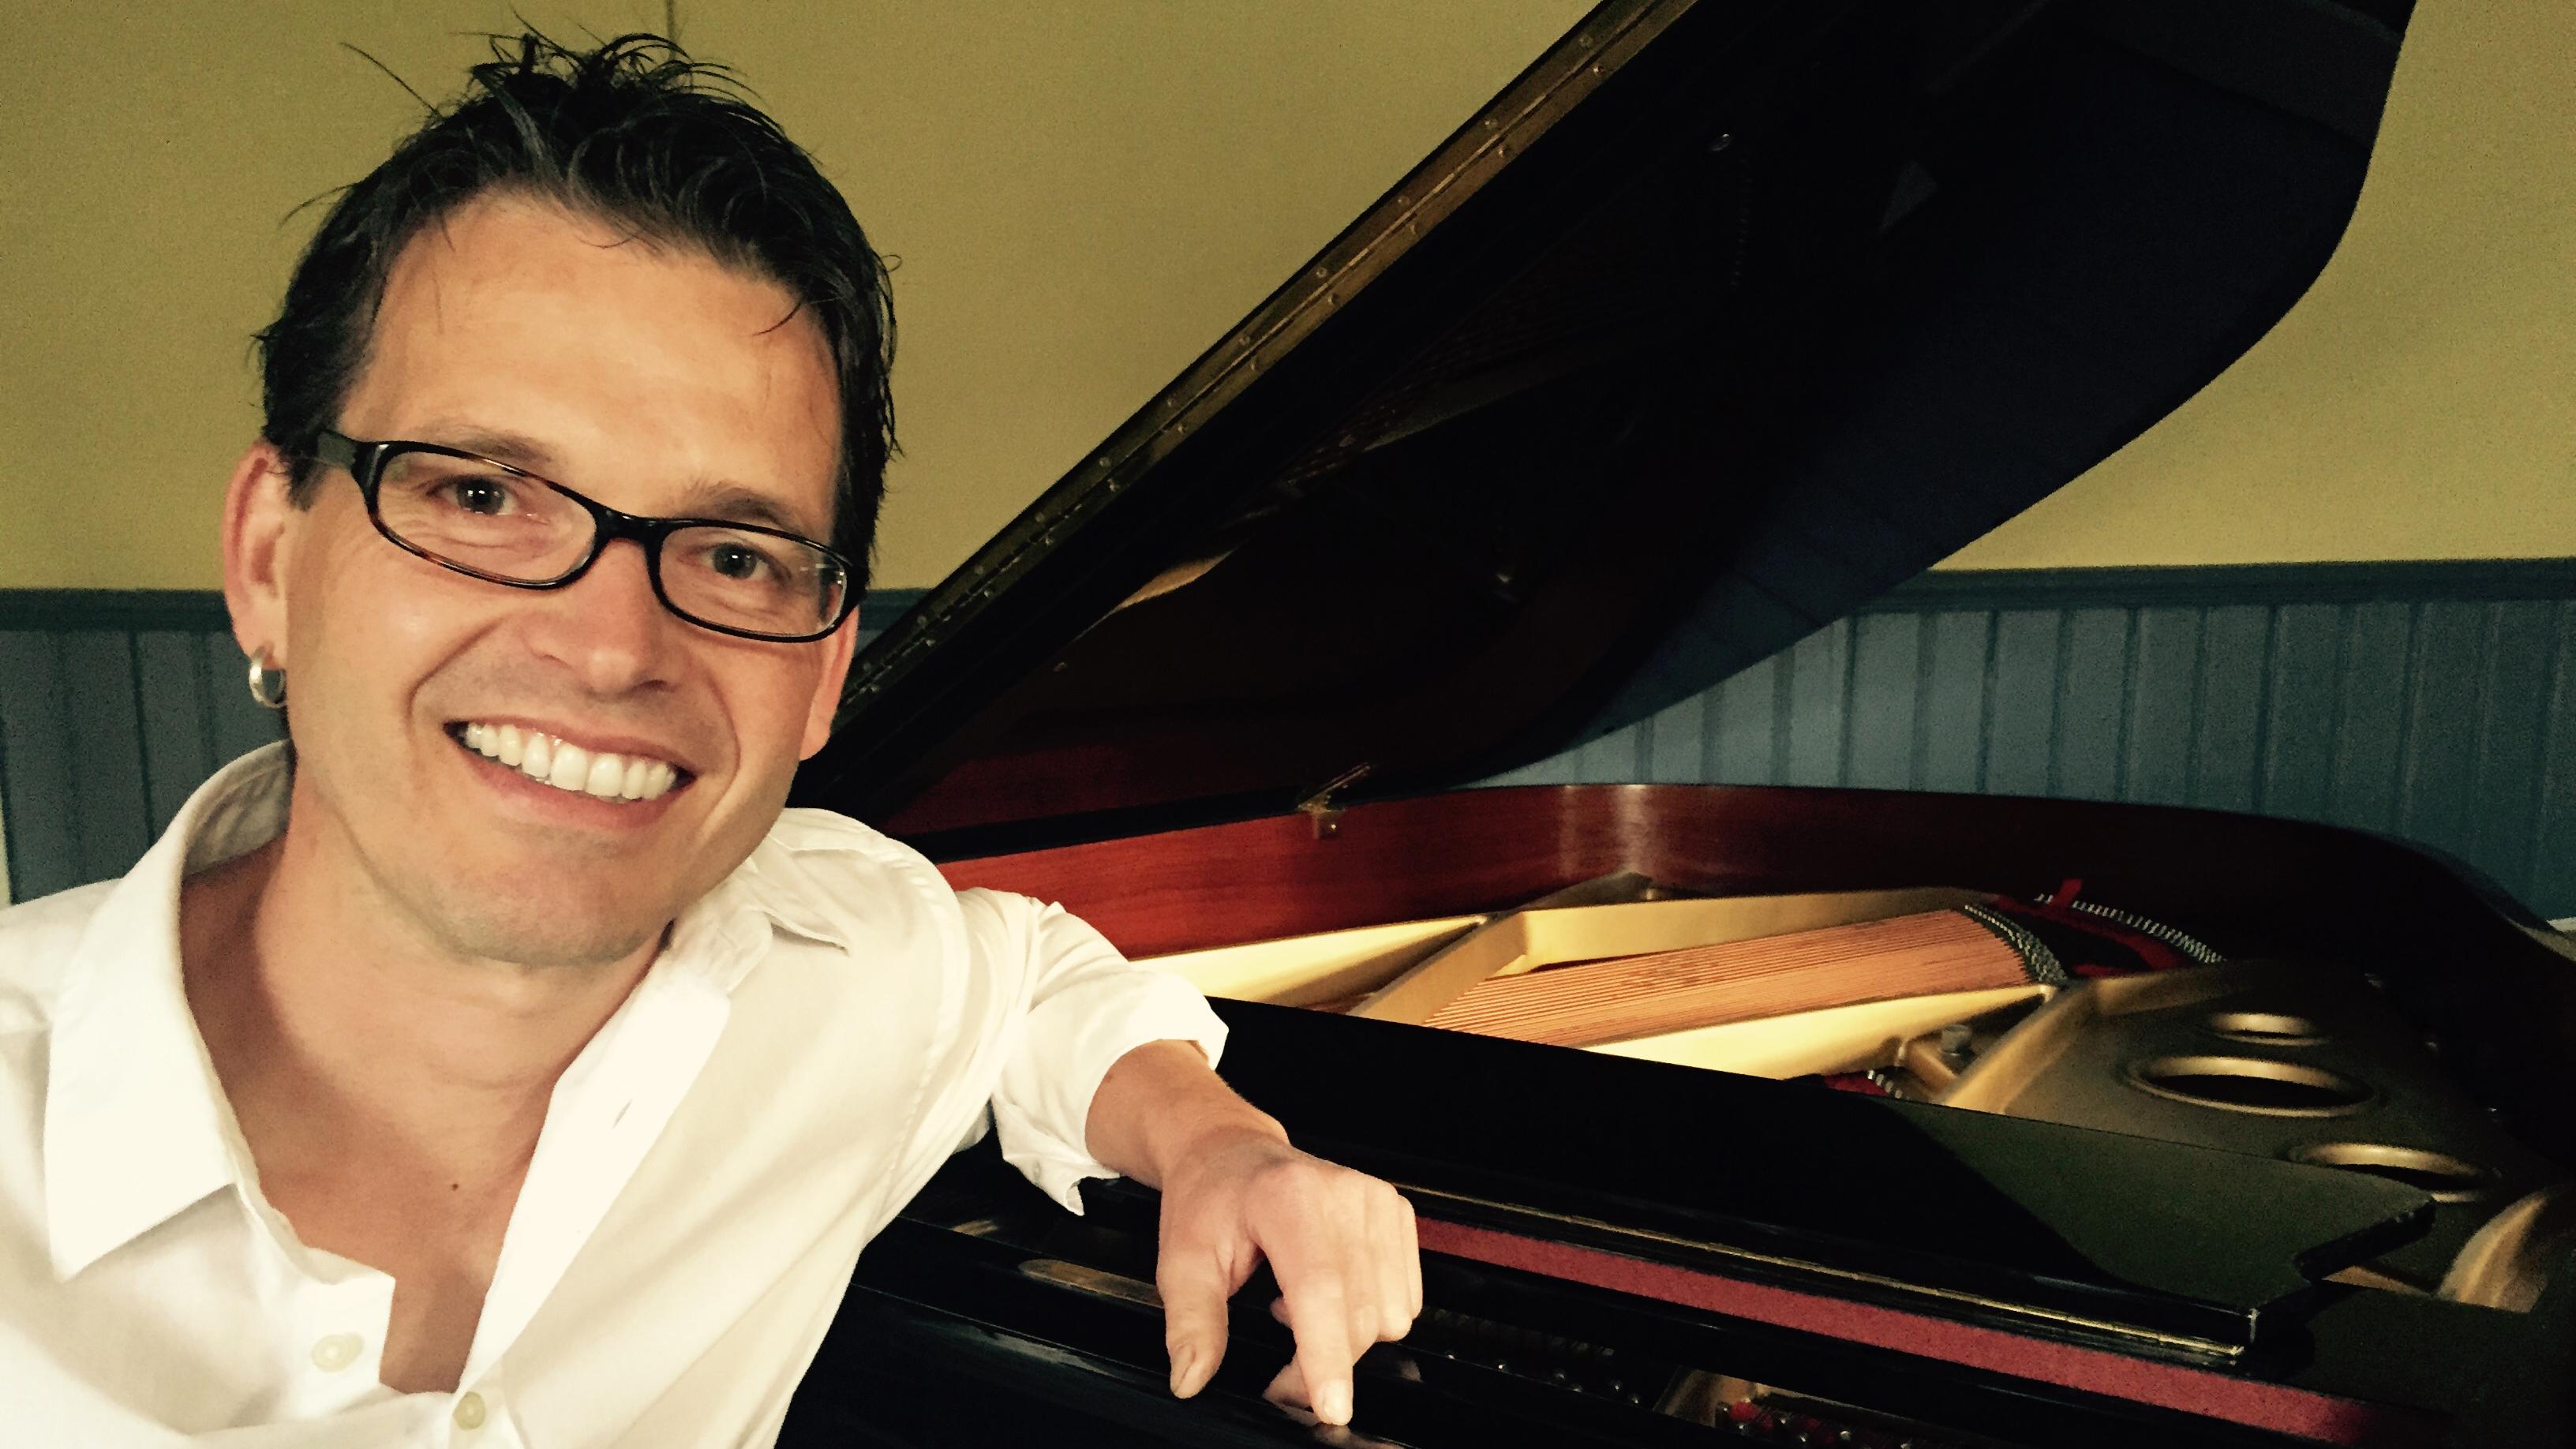 Tobias Lauber am Piano